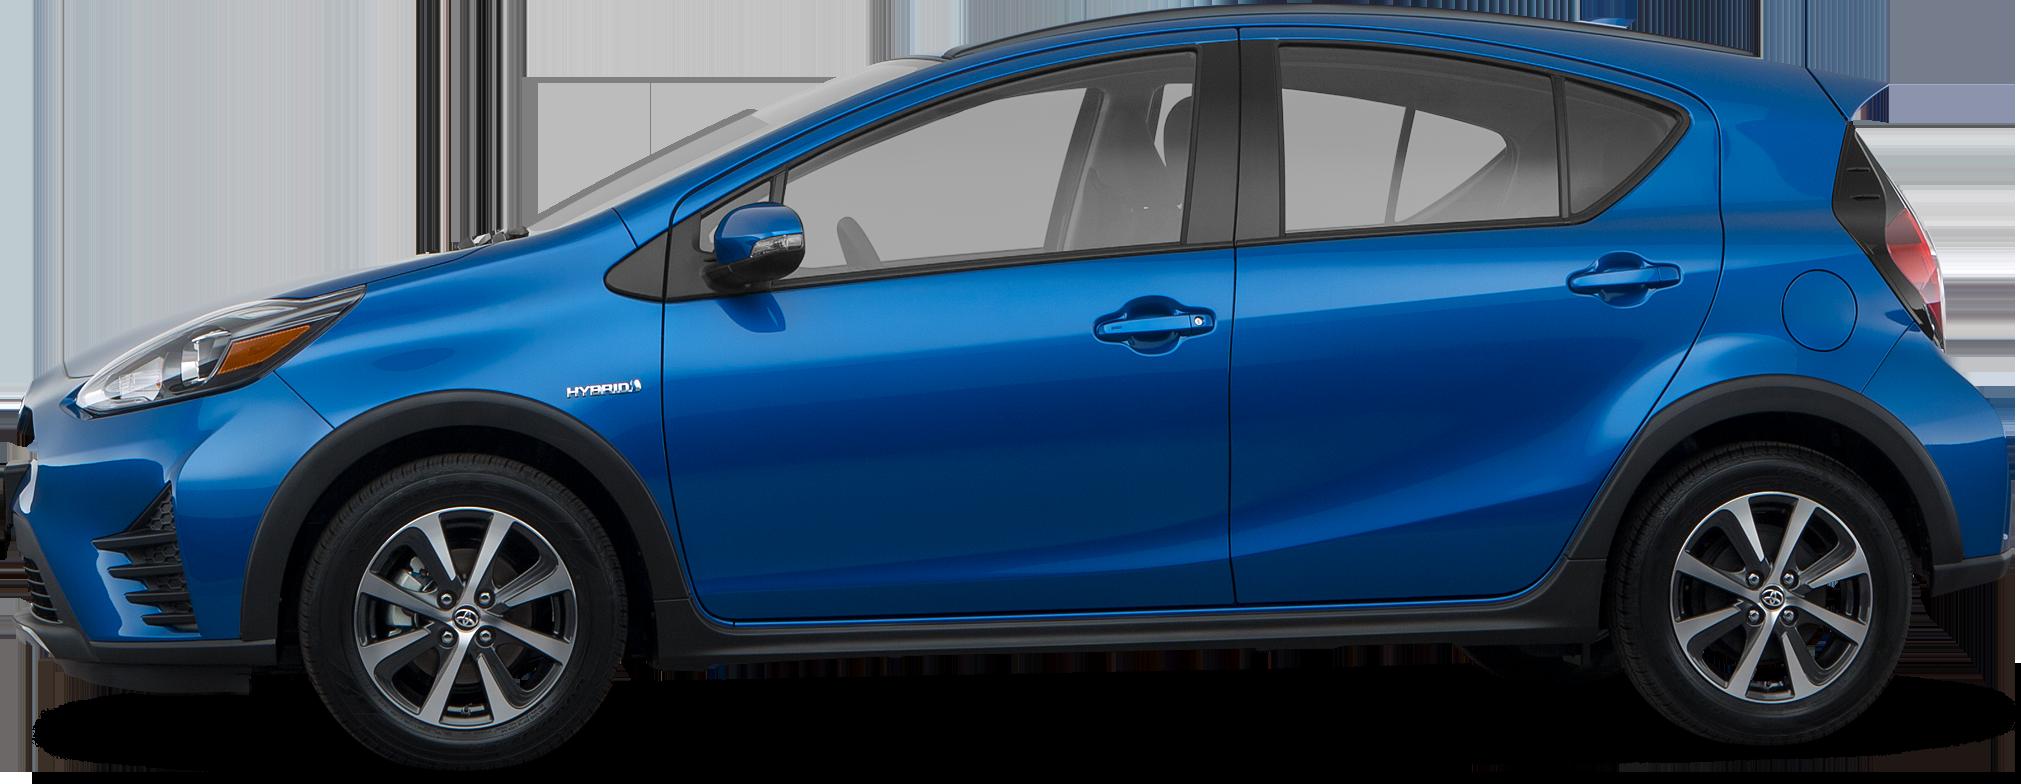 2018 Toyota Prius c Hatchback Three